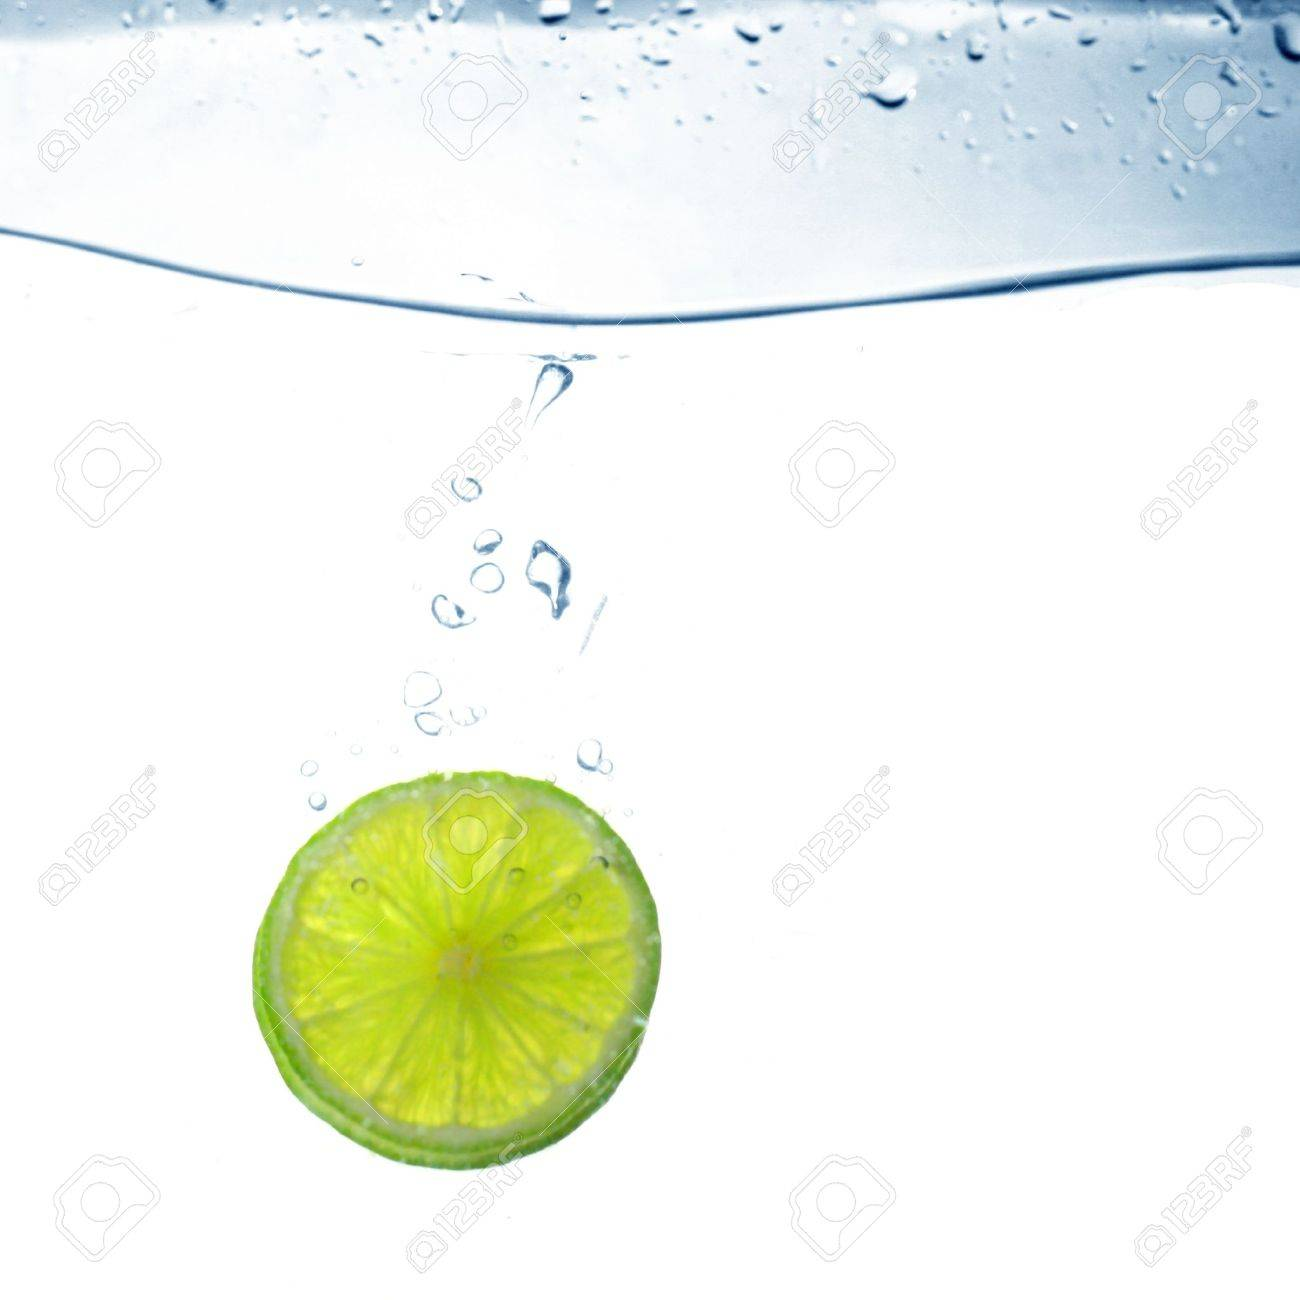 lime water splash freshness drink concept Stock Photo - 8515767